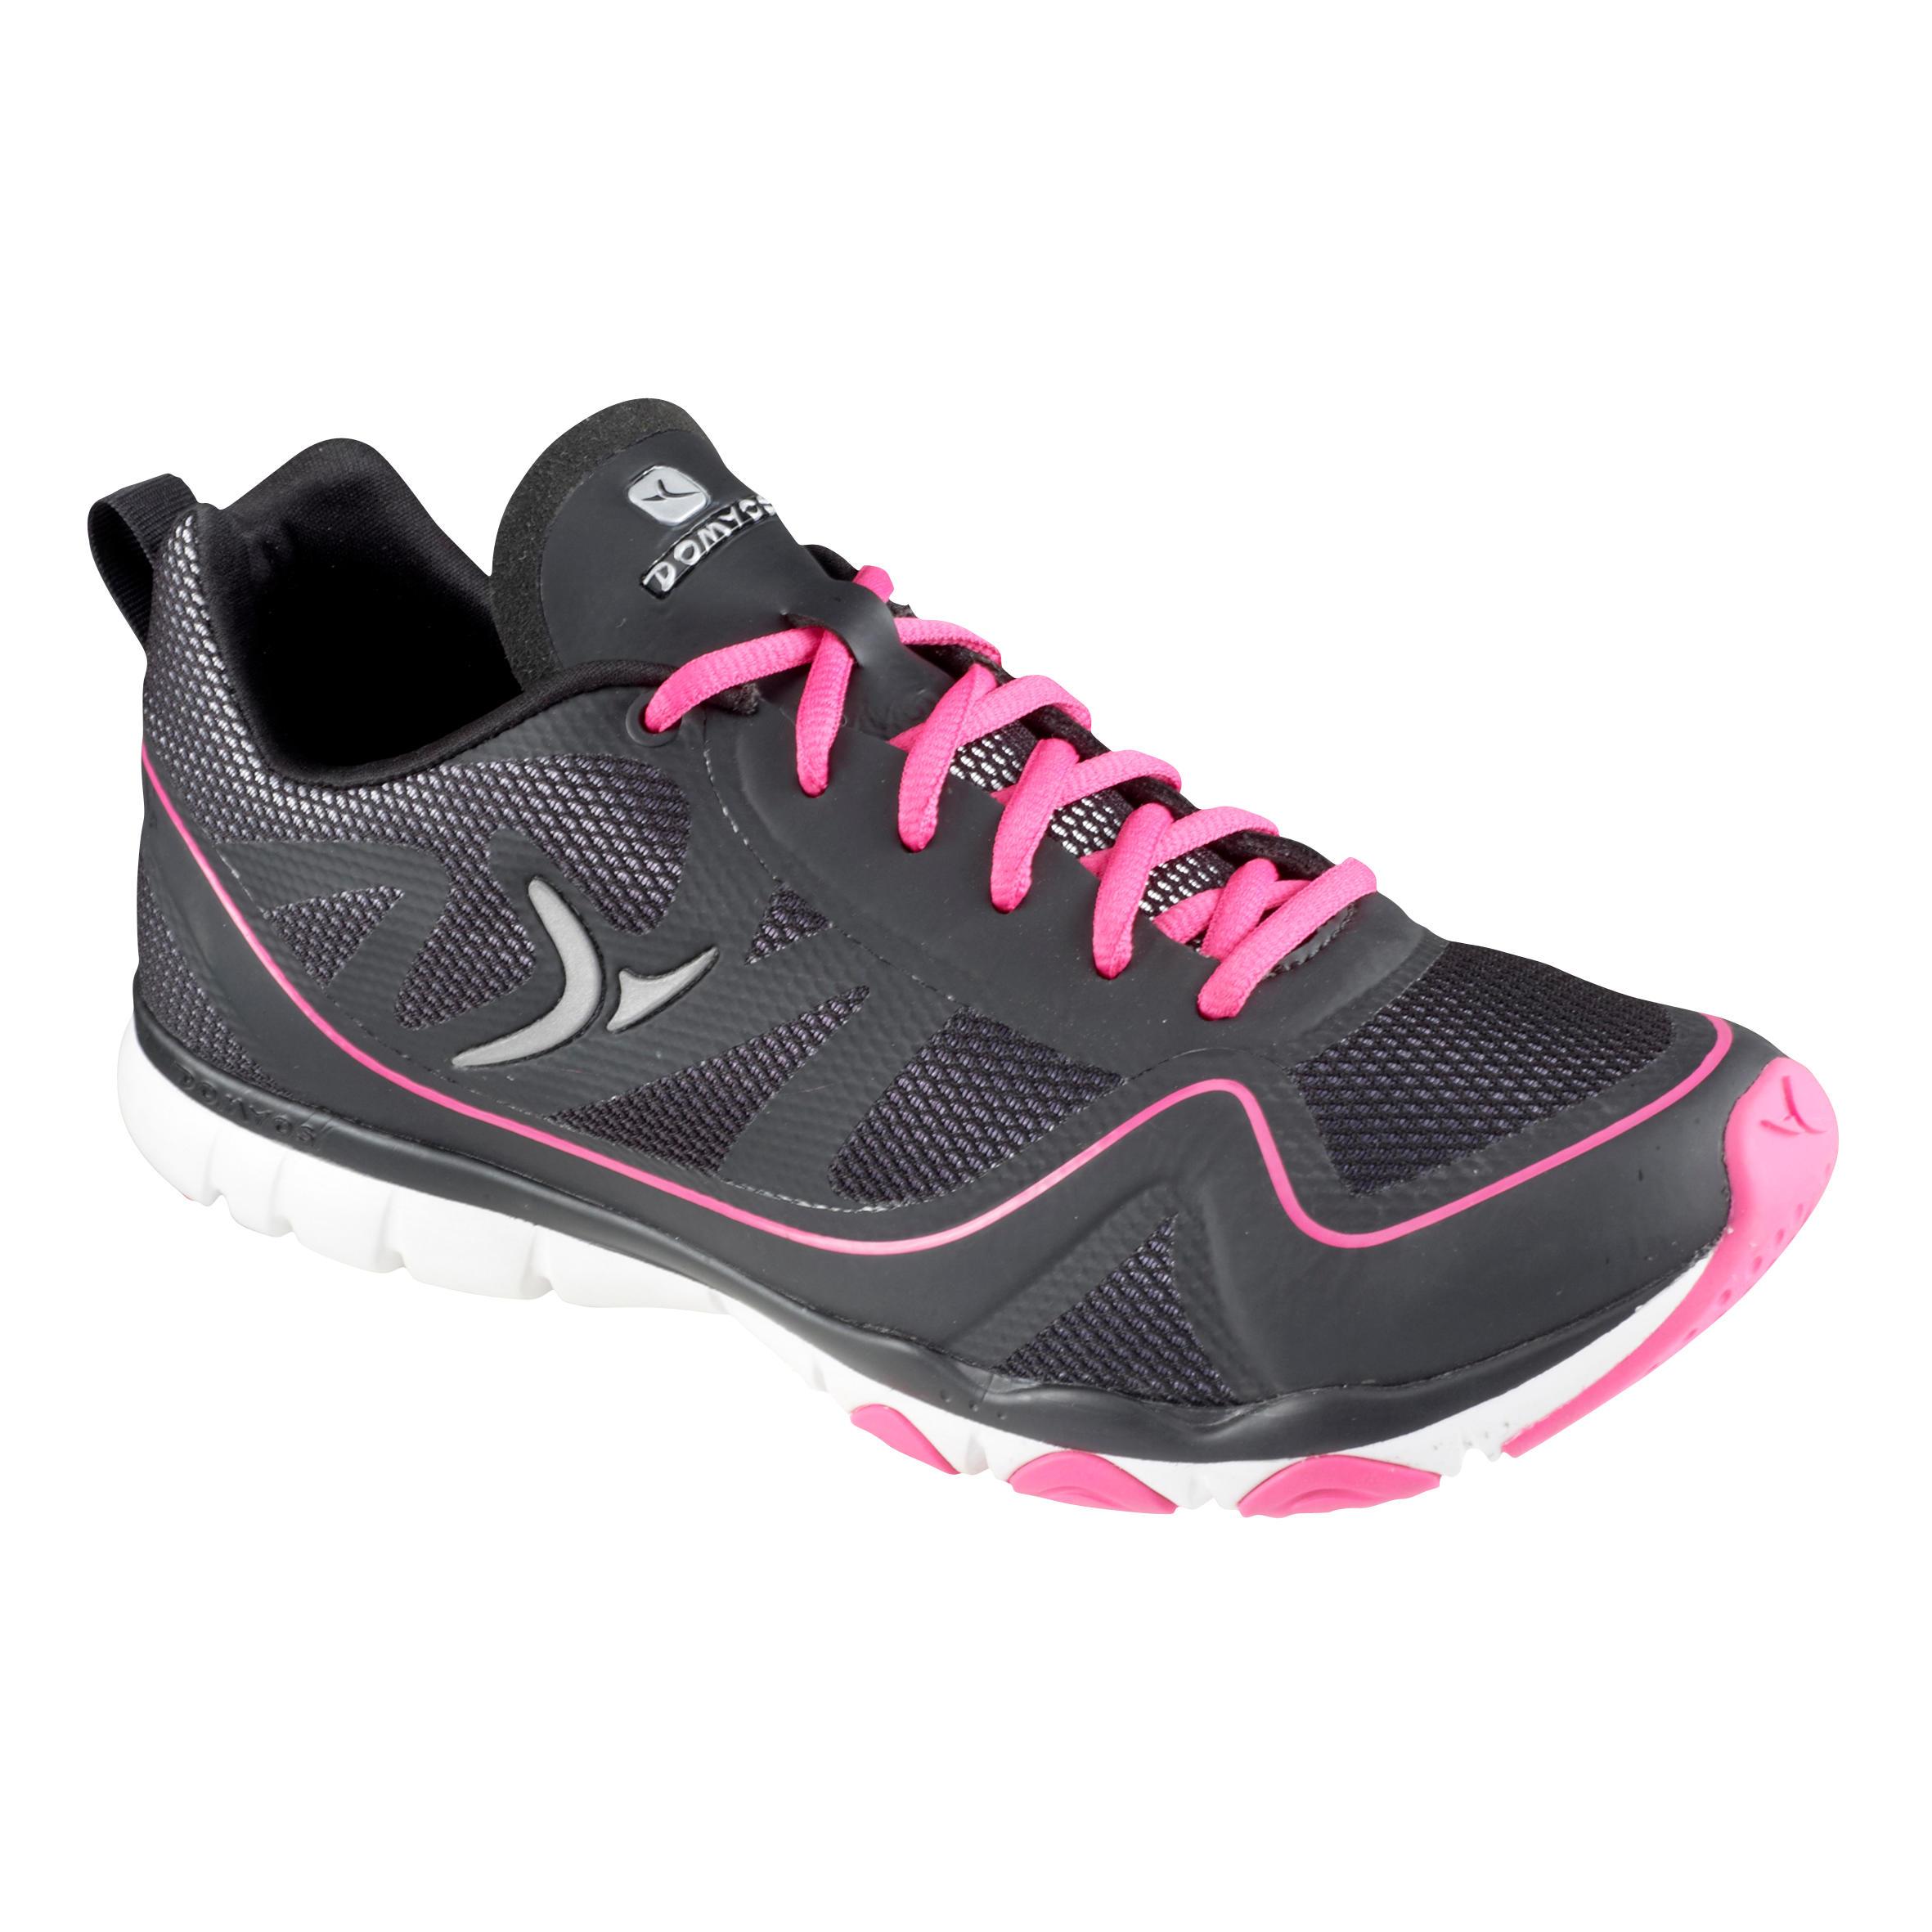 Tenis fitness dama 360+ negro rosa